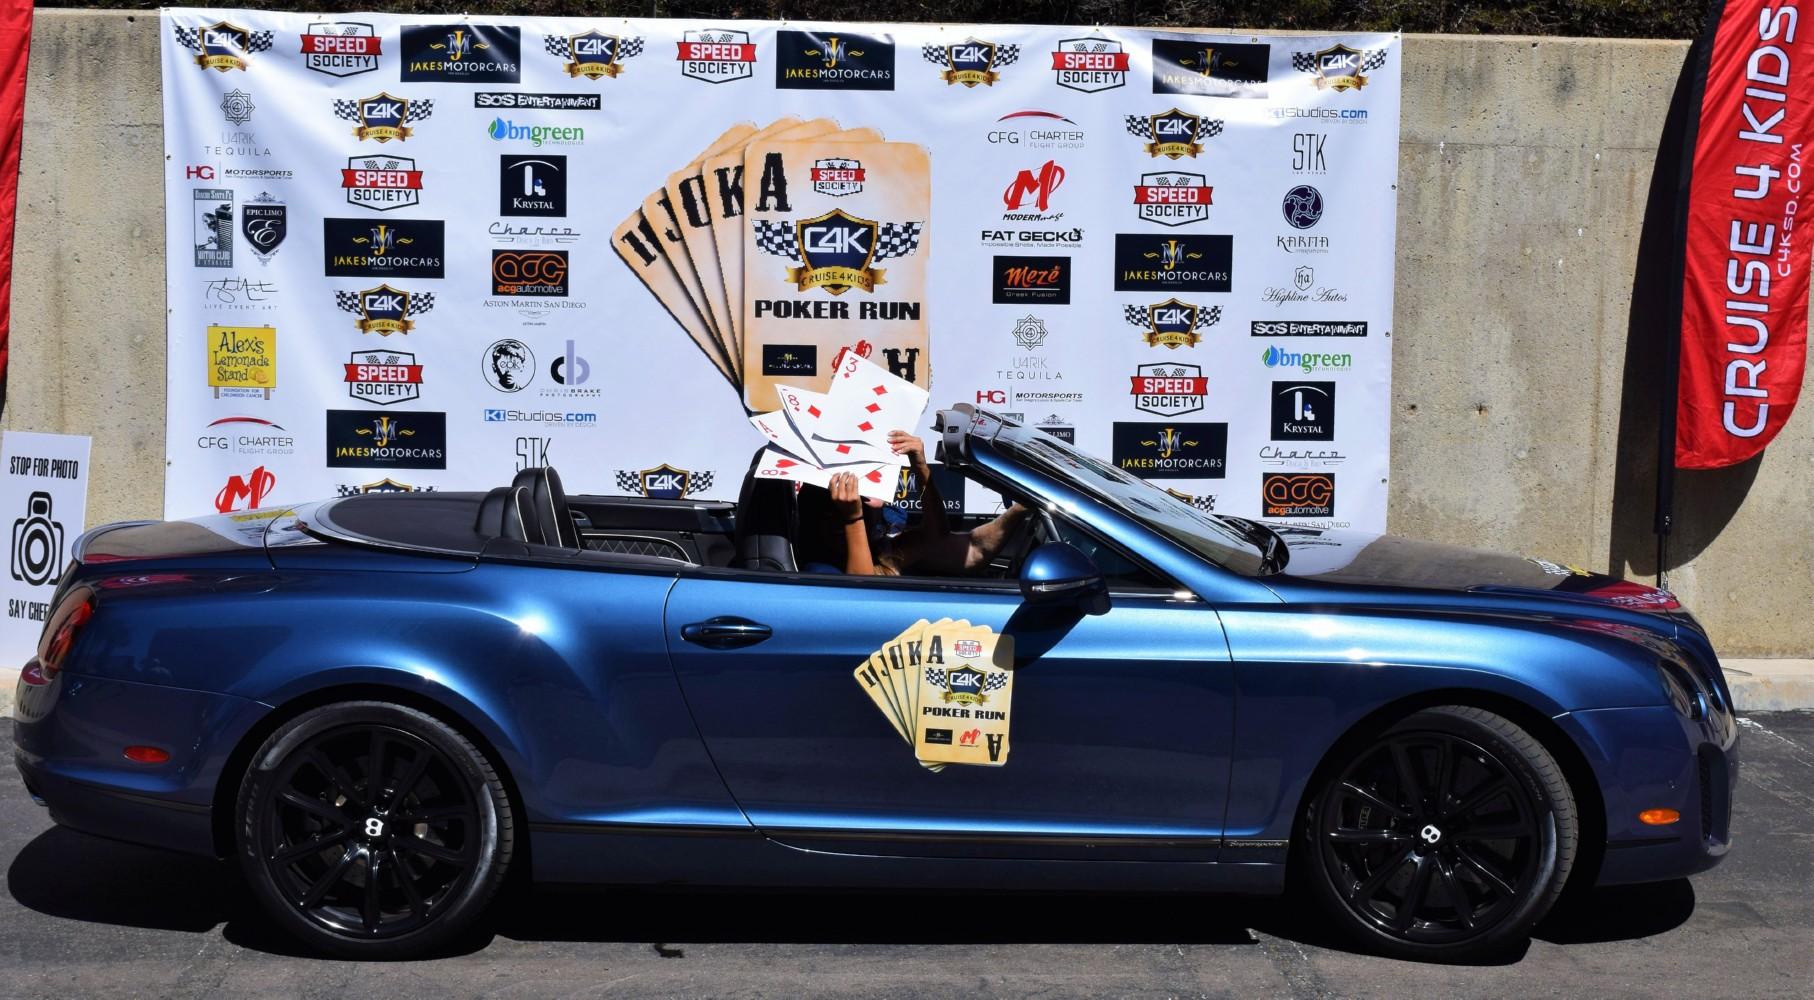 Poker Run 2017 Banner Photos - 10.jpg